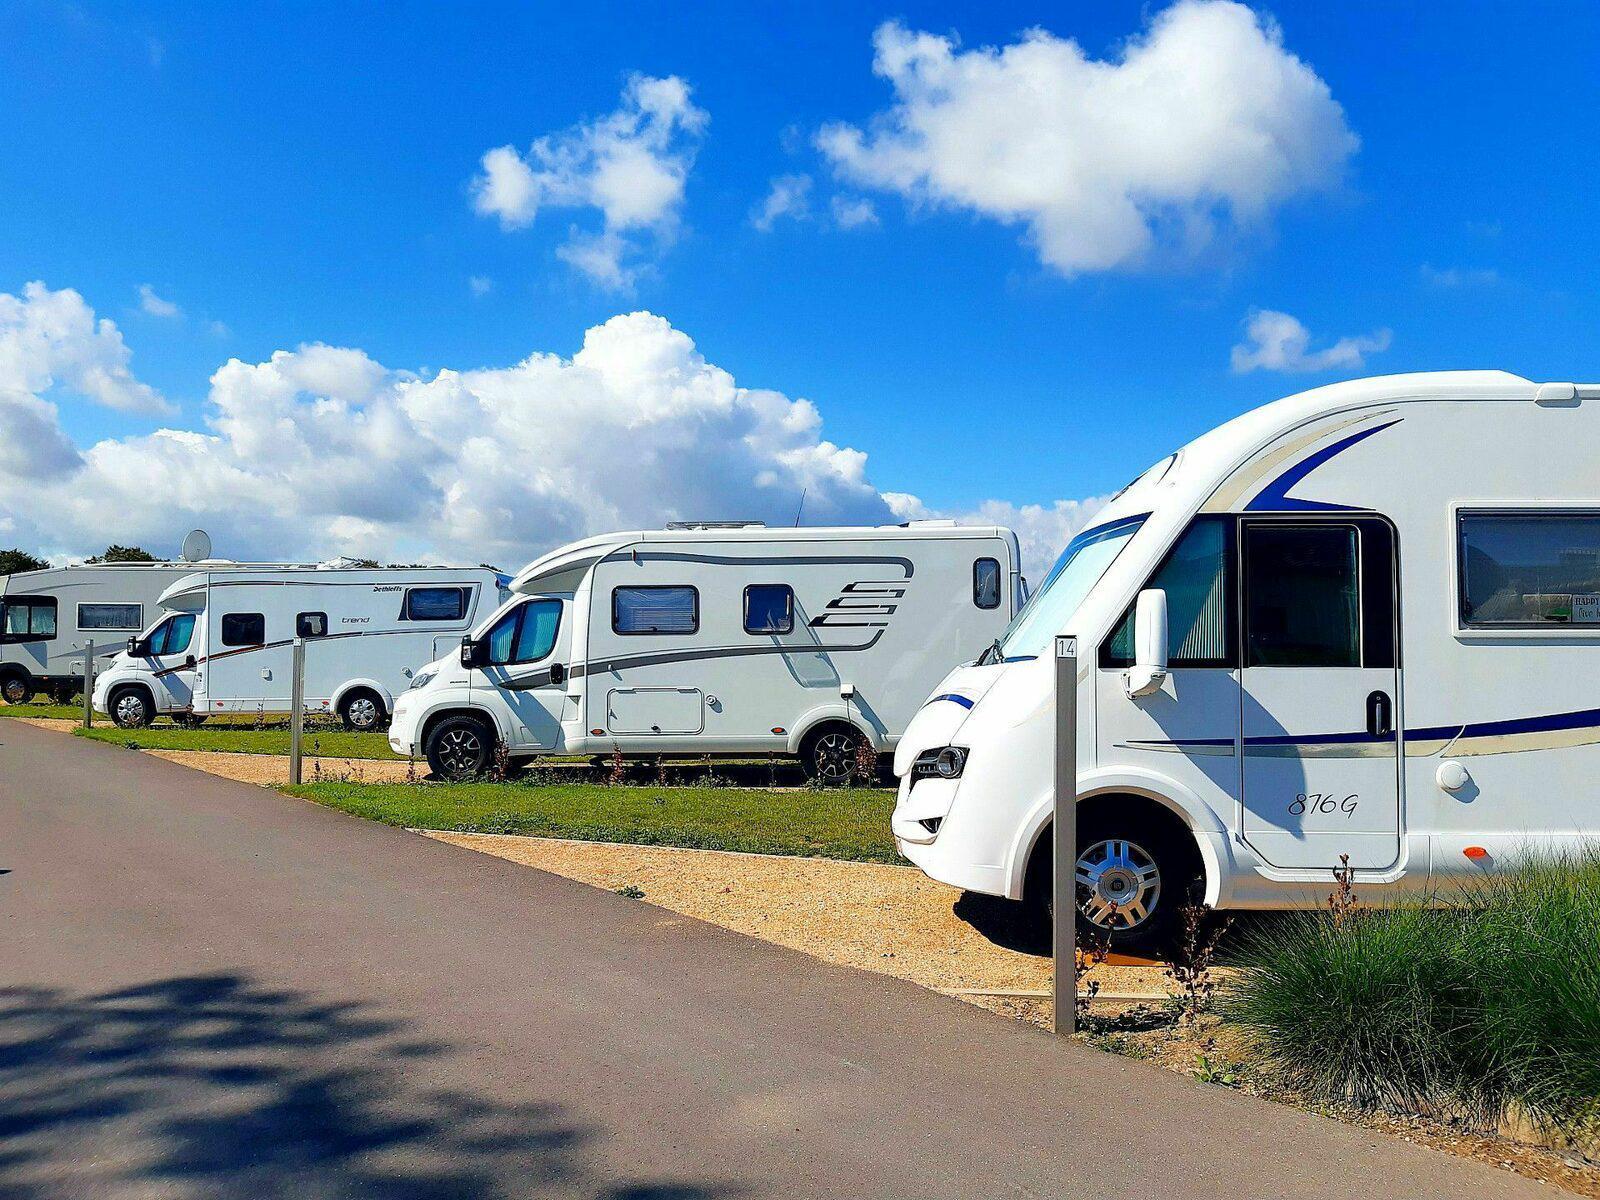 Kompas Camping Nieuwpoort Camperplaats